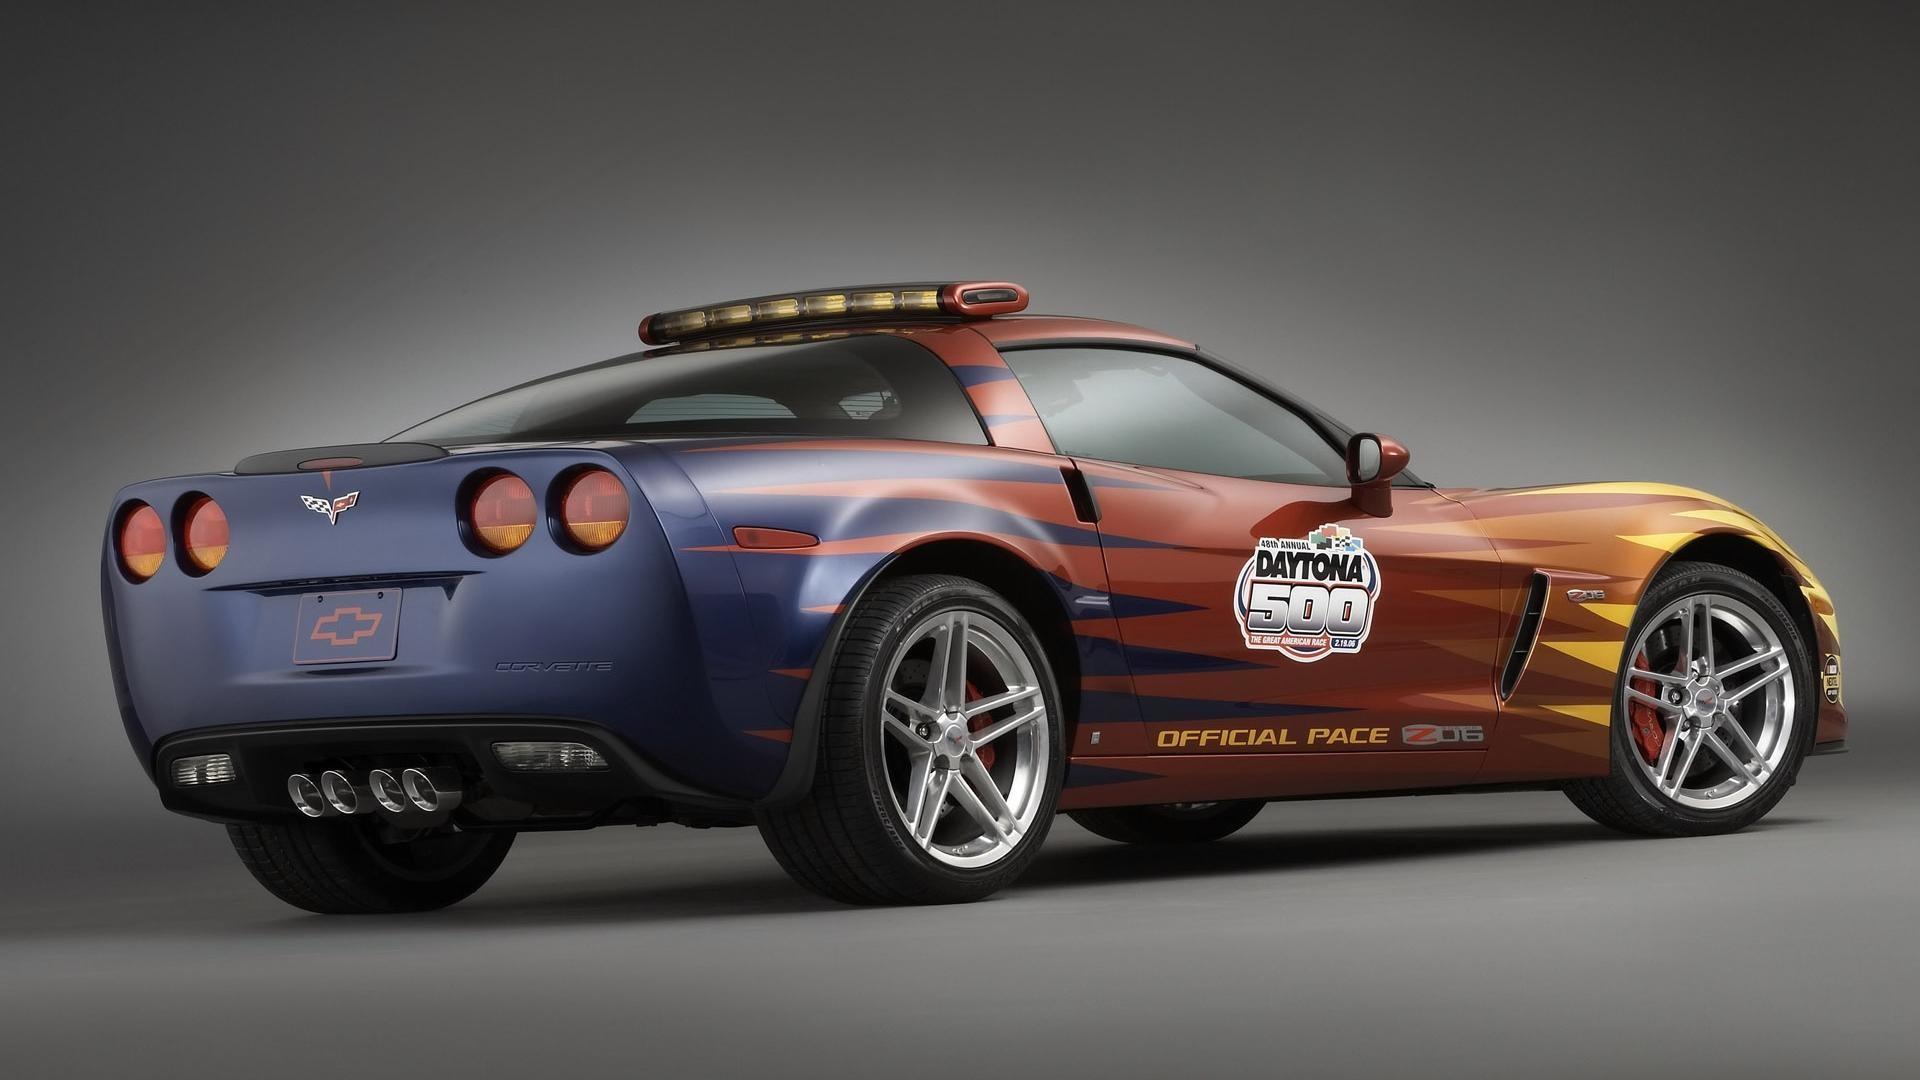 c5 corvette wallpaper 58 images